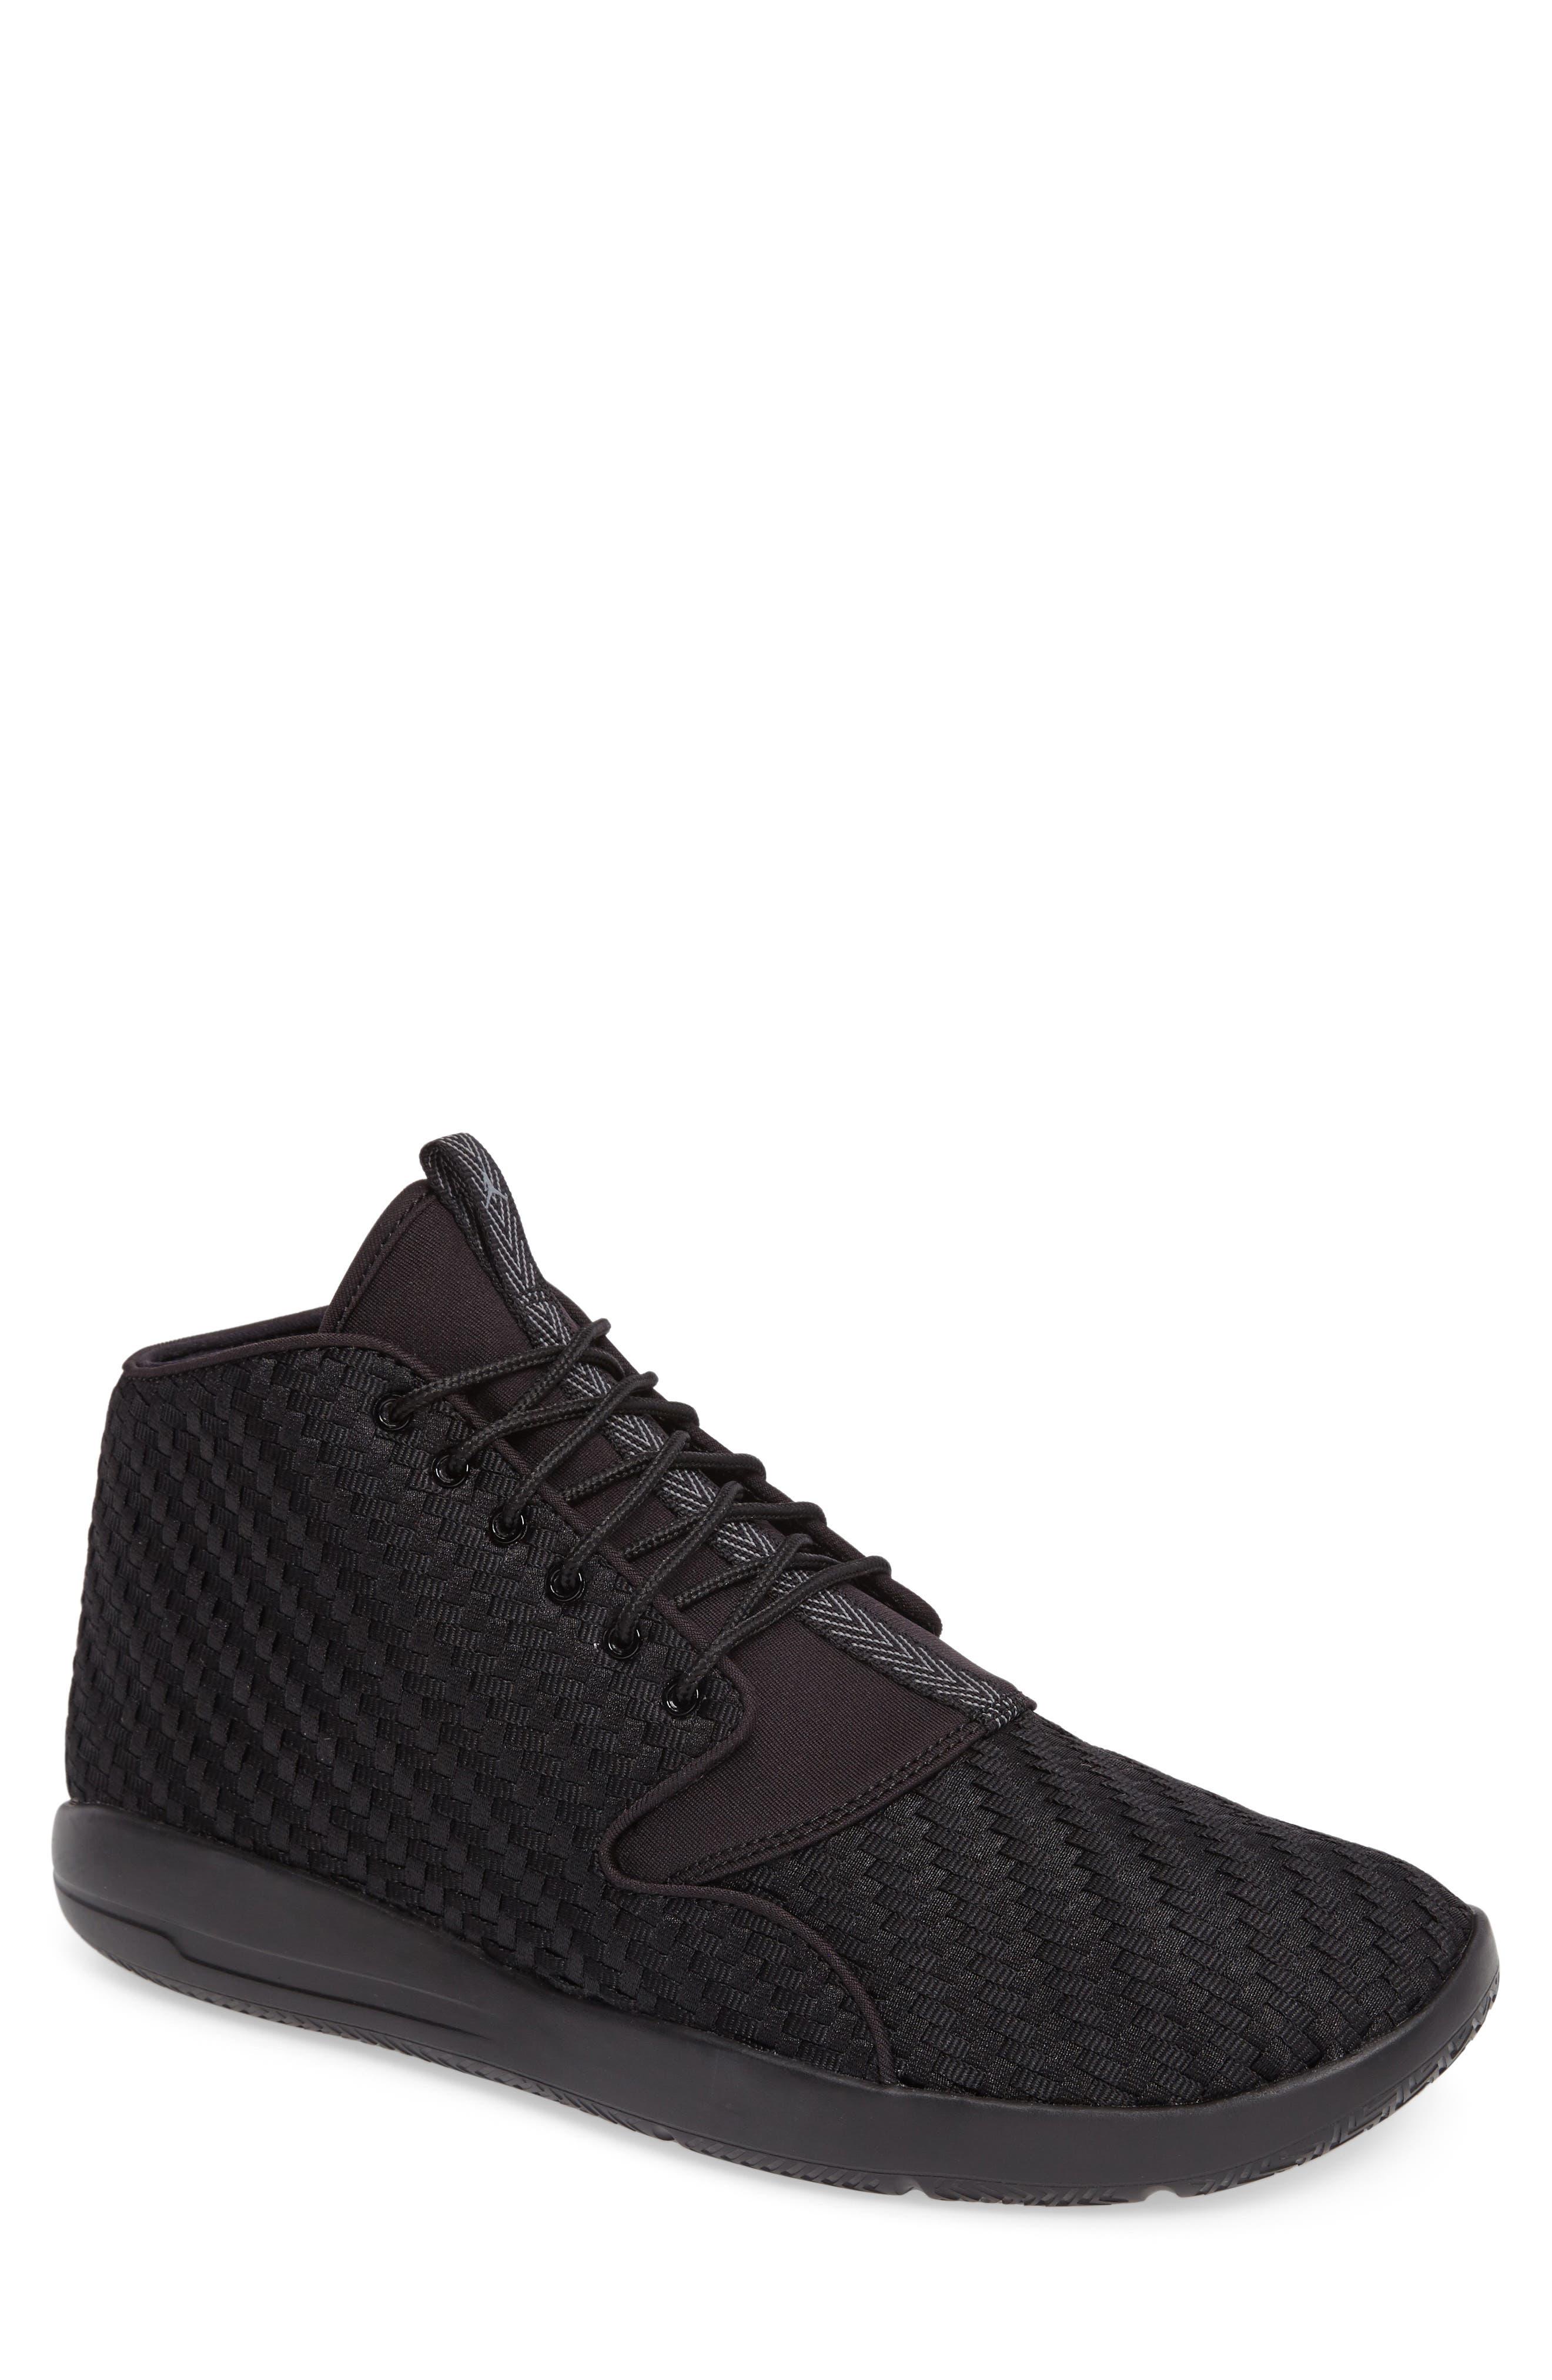 Main Image - Nike Jordan Eclipse Woven Chukka Sneaker (Men)